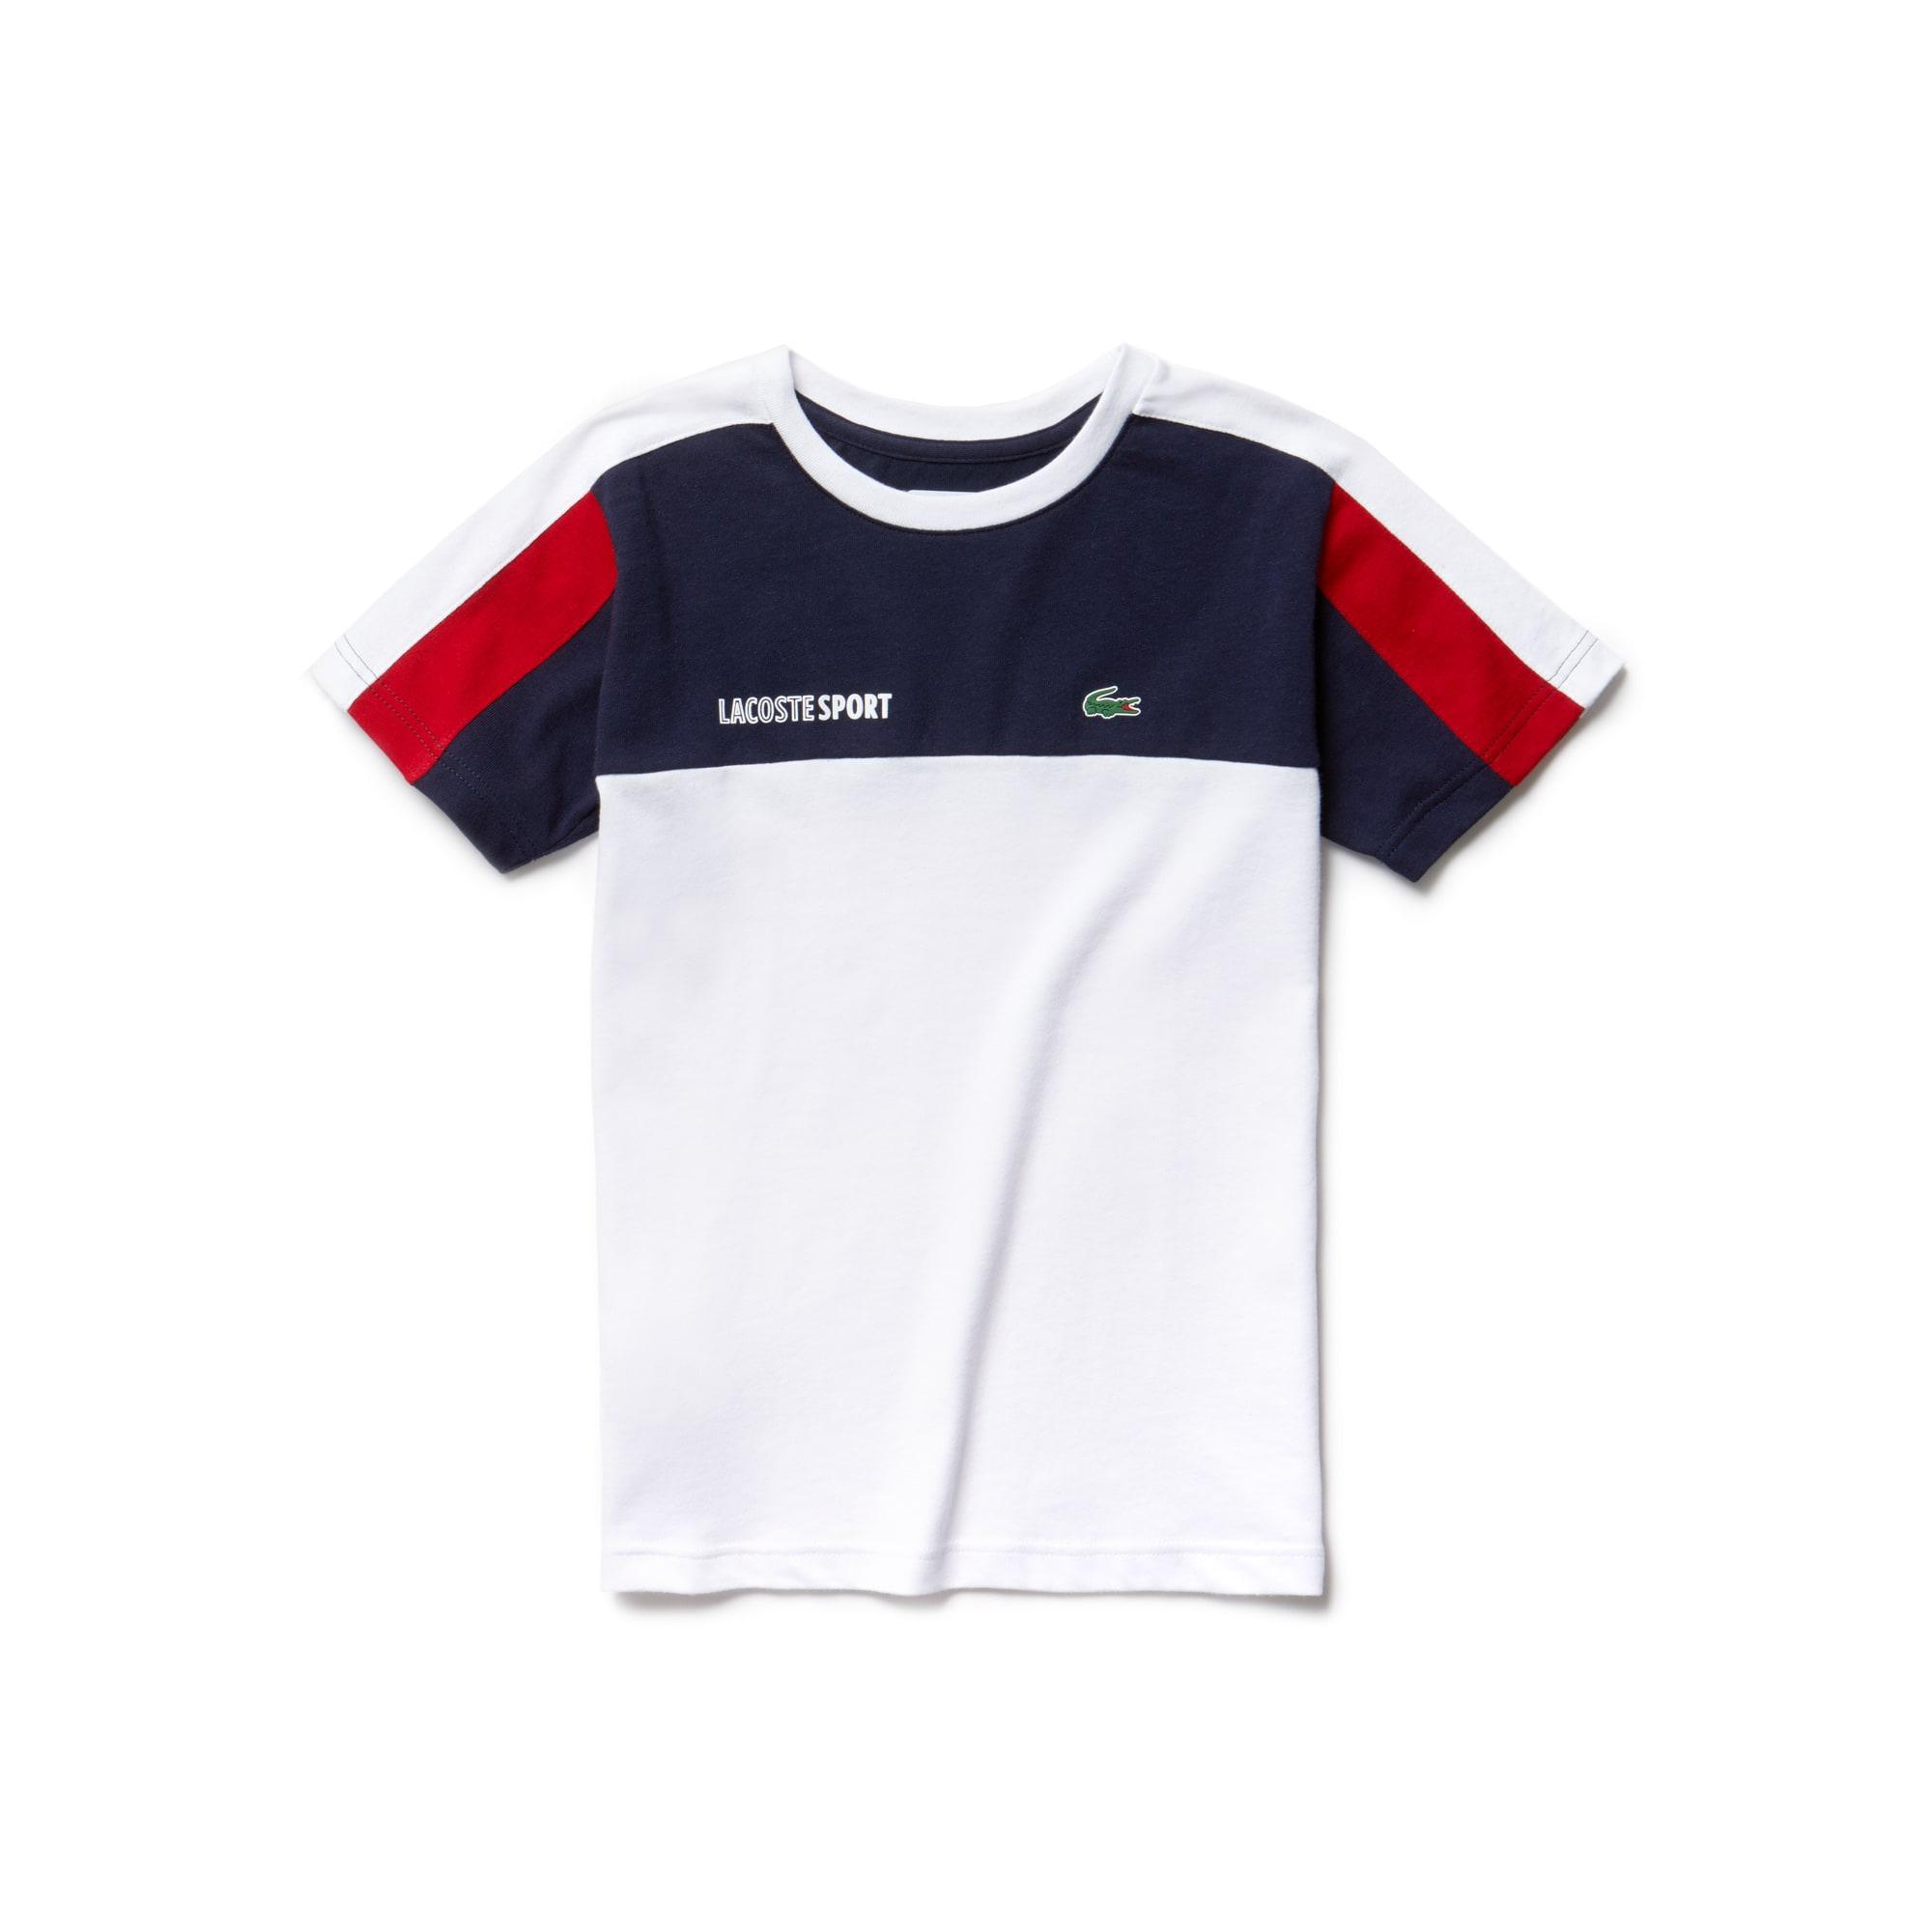 T T Sport Sport ShirtsKids T Sport ShirtsKids Lacoste ShirtsKids Lacoste ShirtsKids Lacoste T wZOXuiPkT